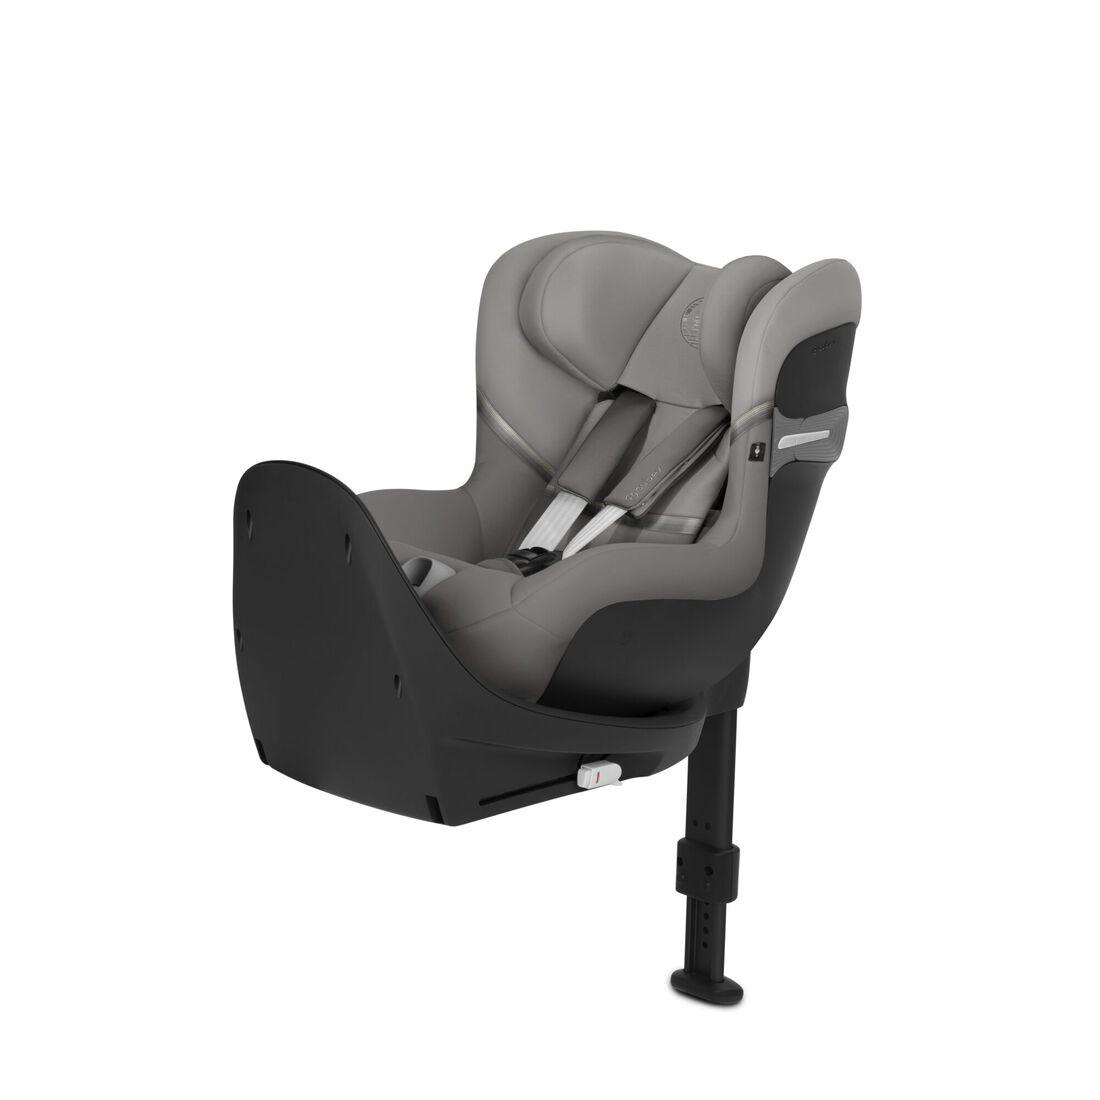 CYBEX Sirona SX2 i-Size - Soho Grey in Soho Grey large Bild 1